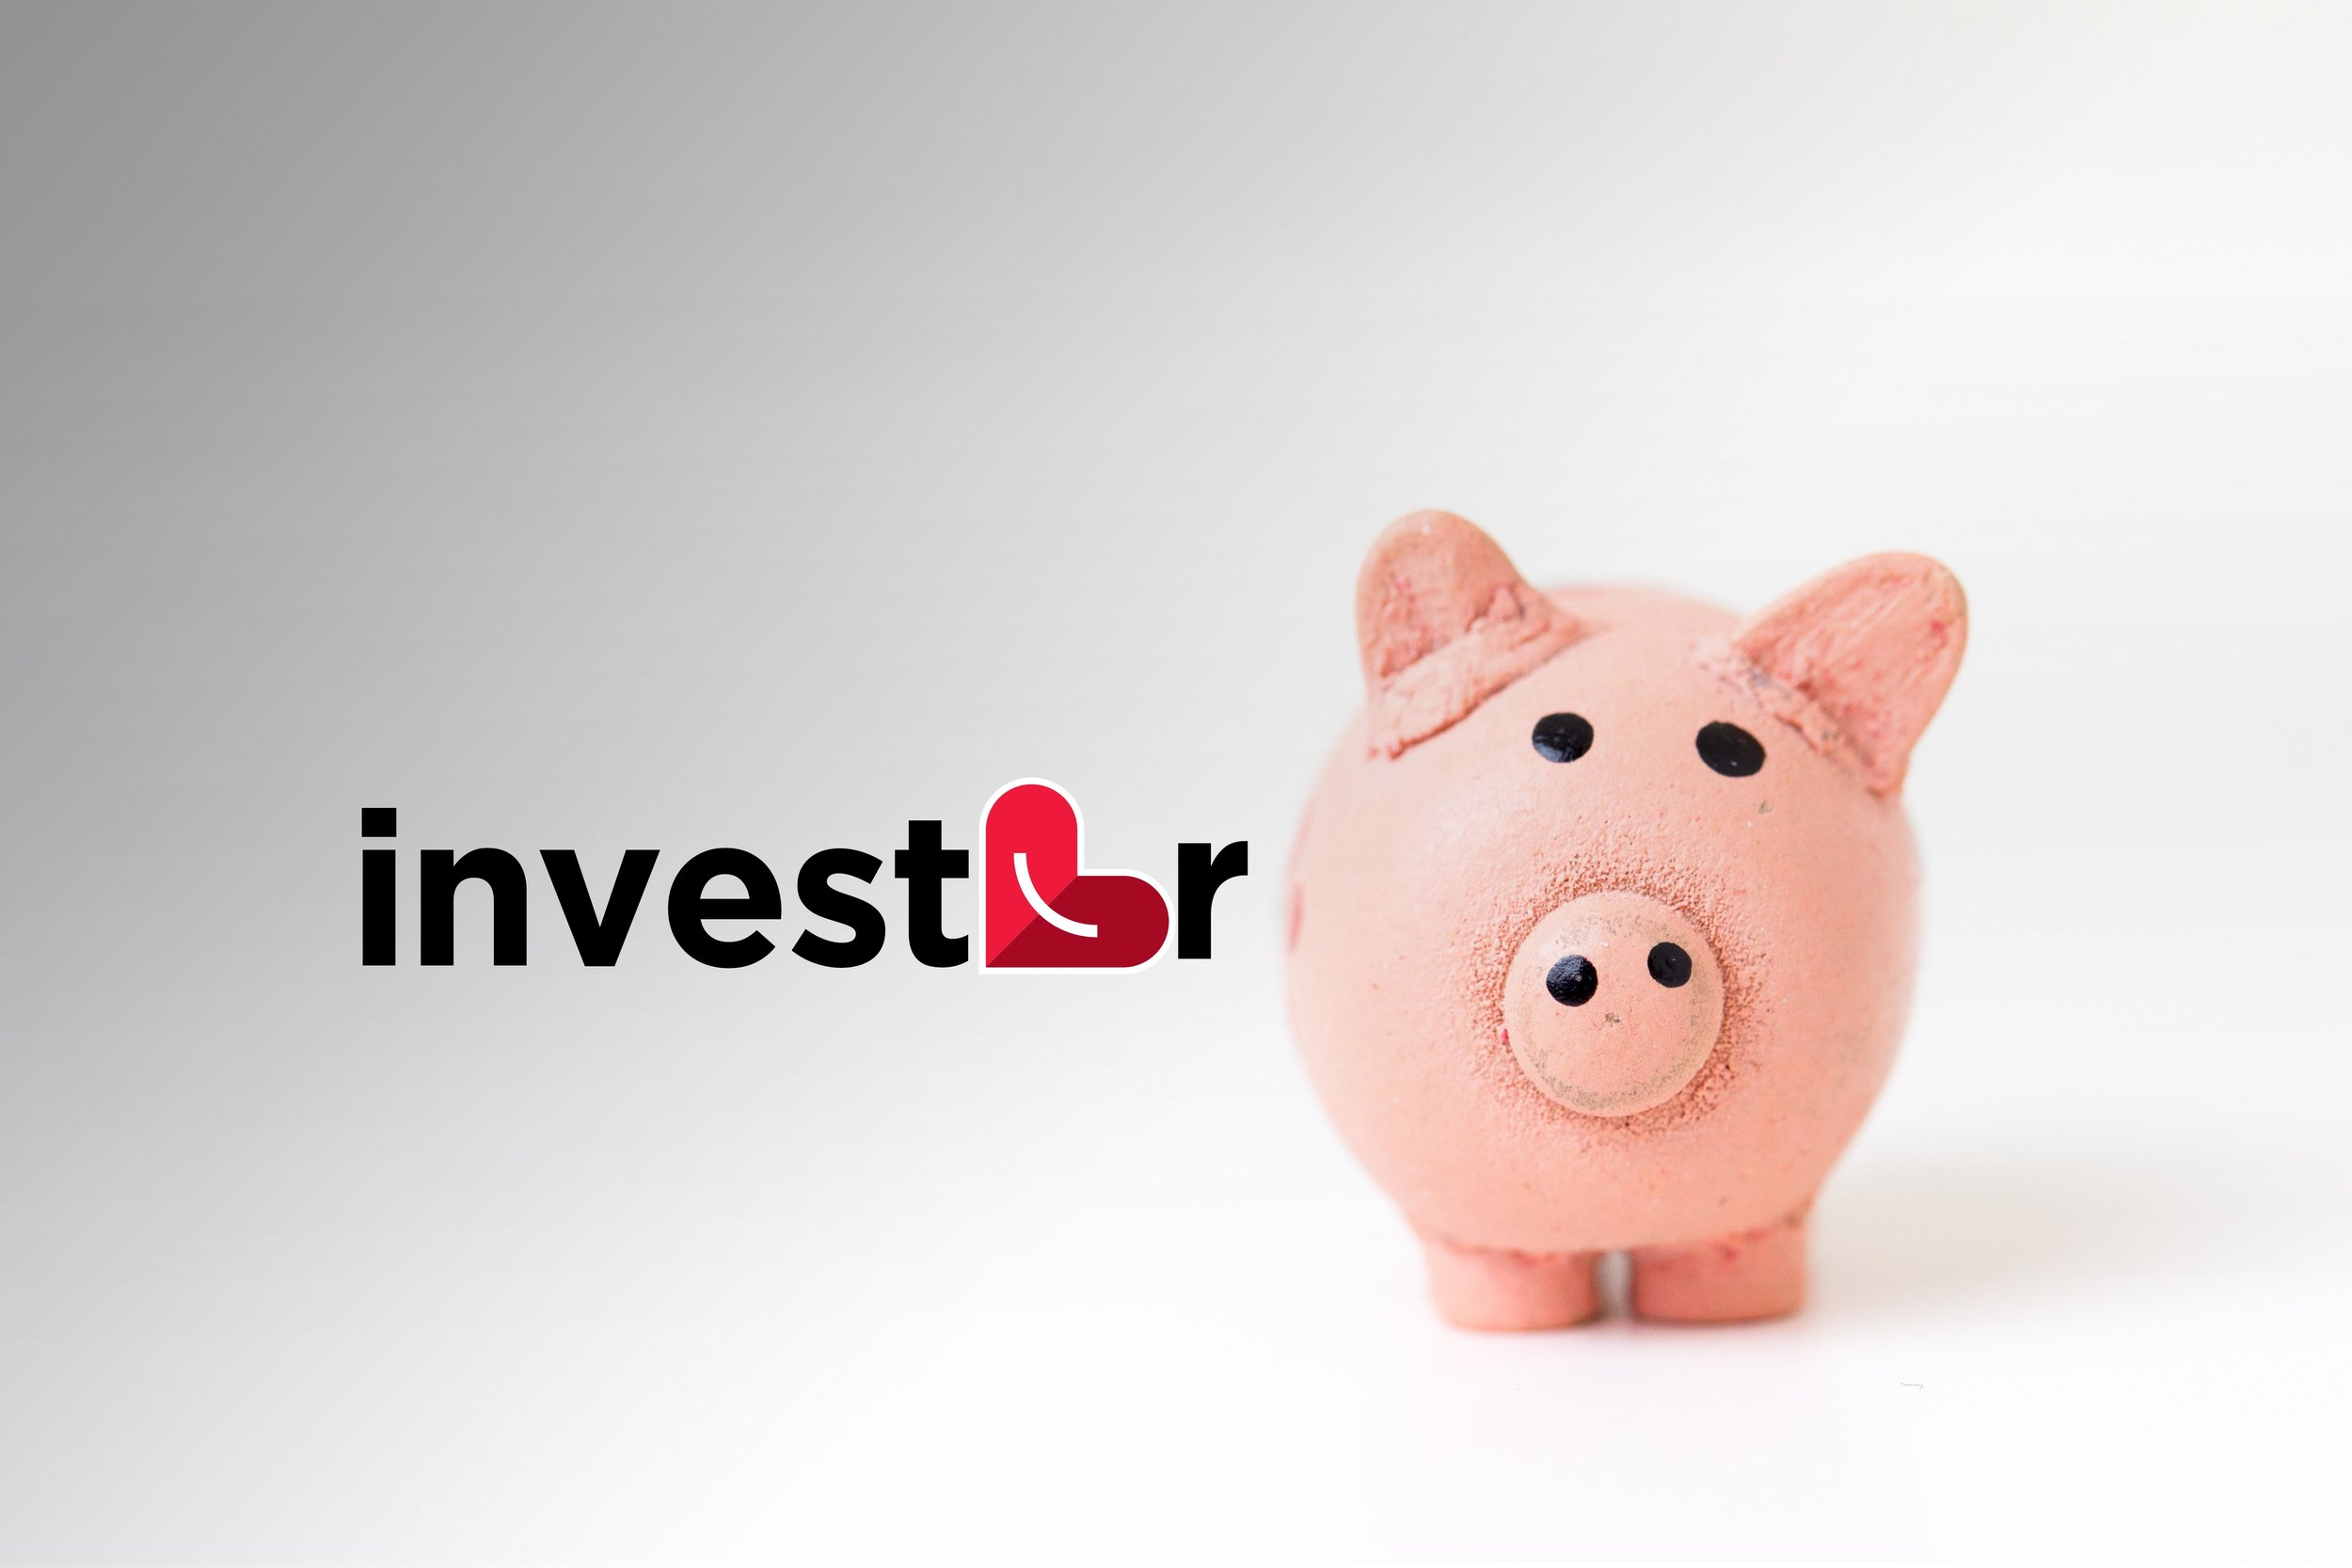 investor2.jpg